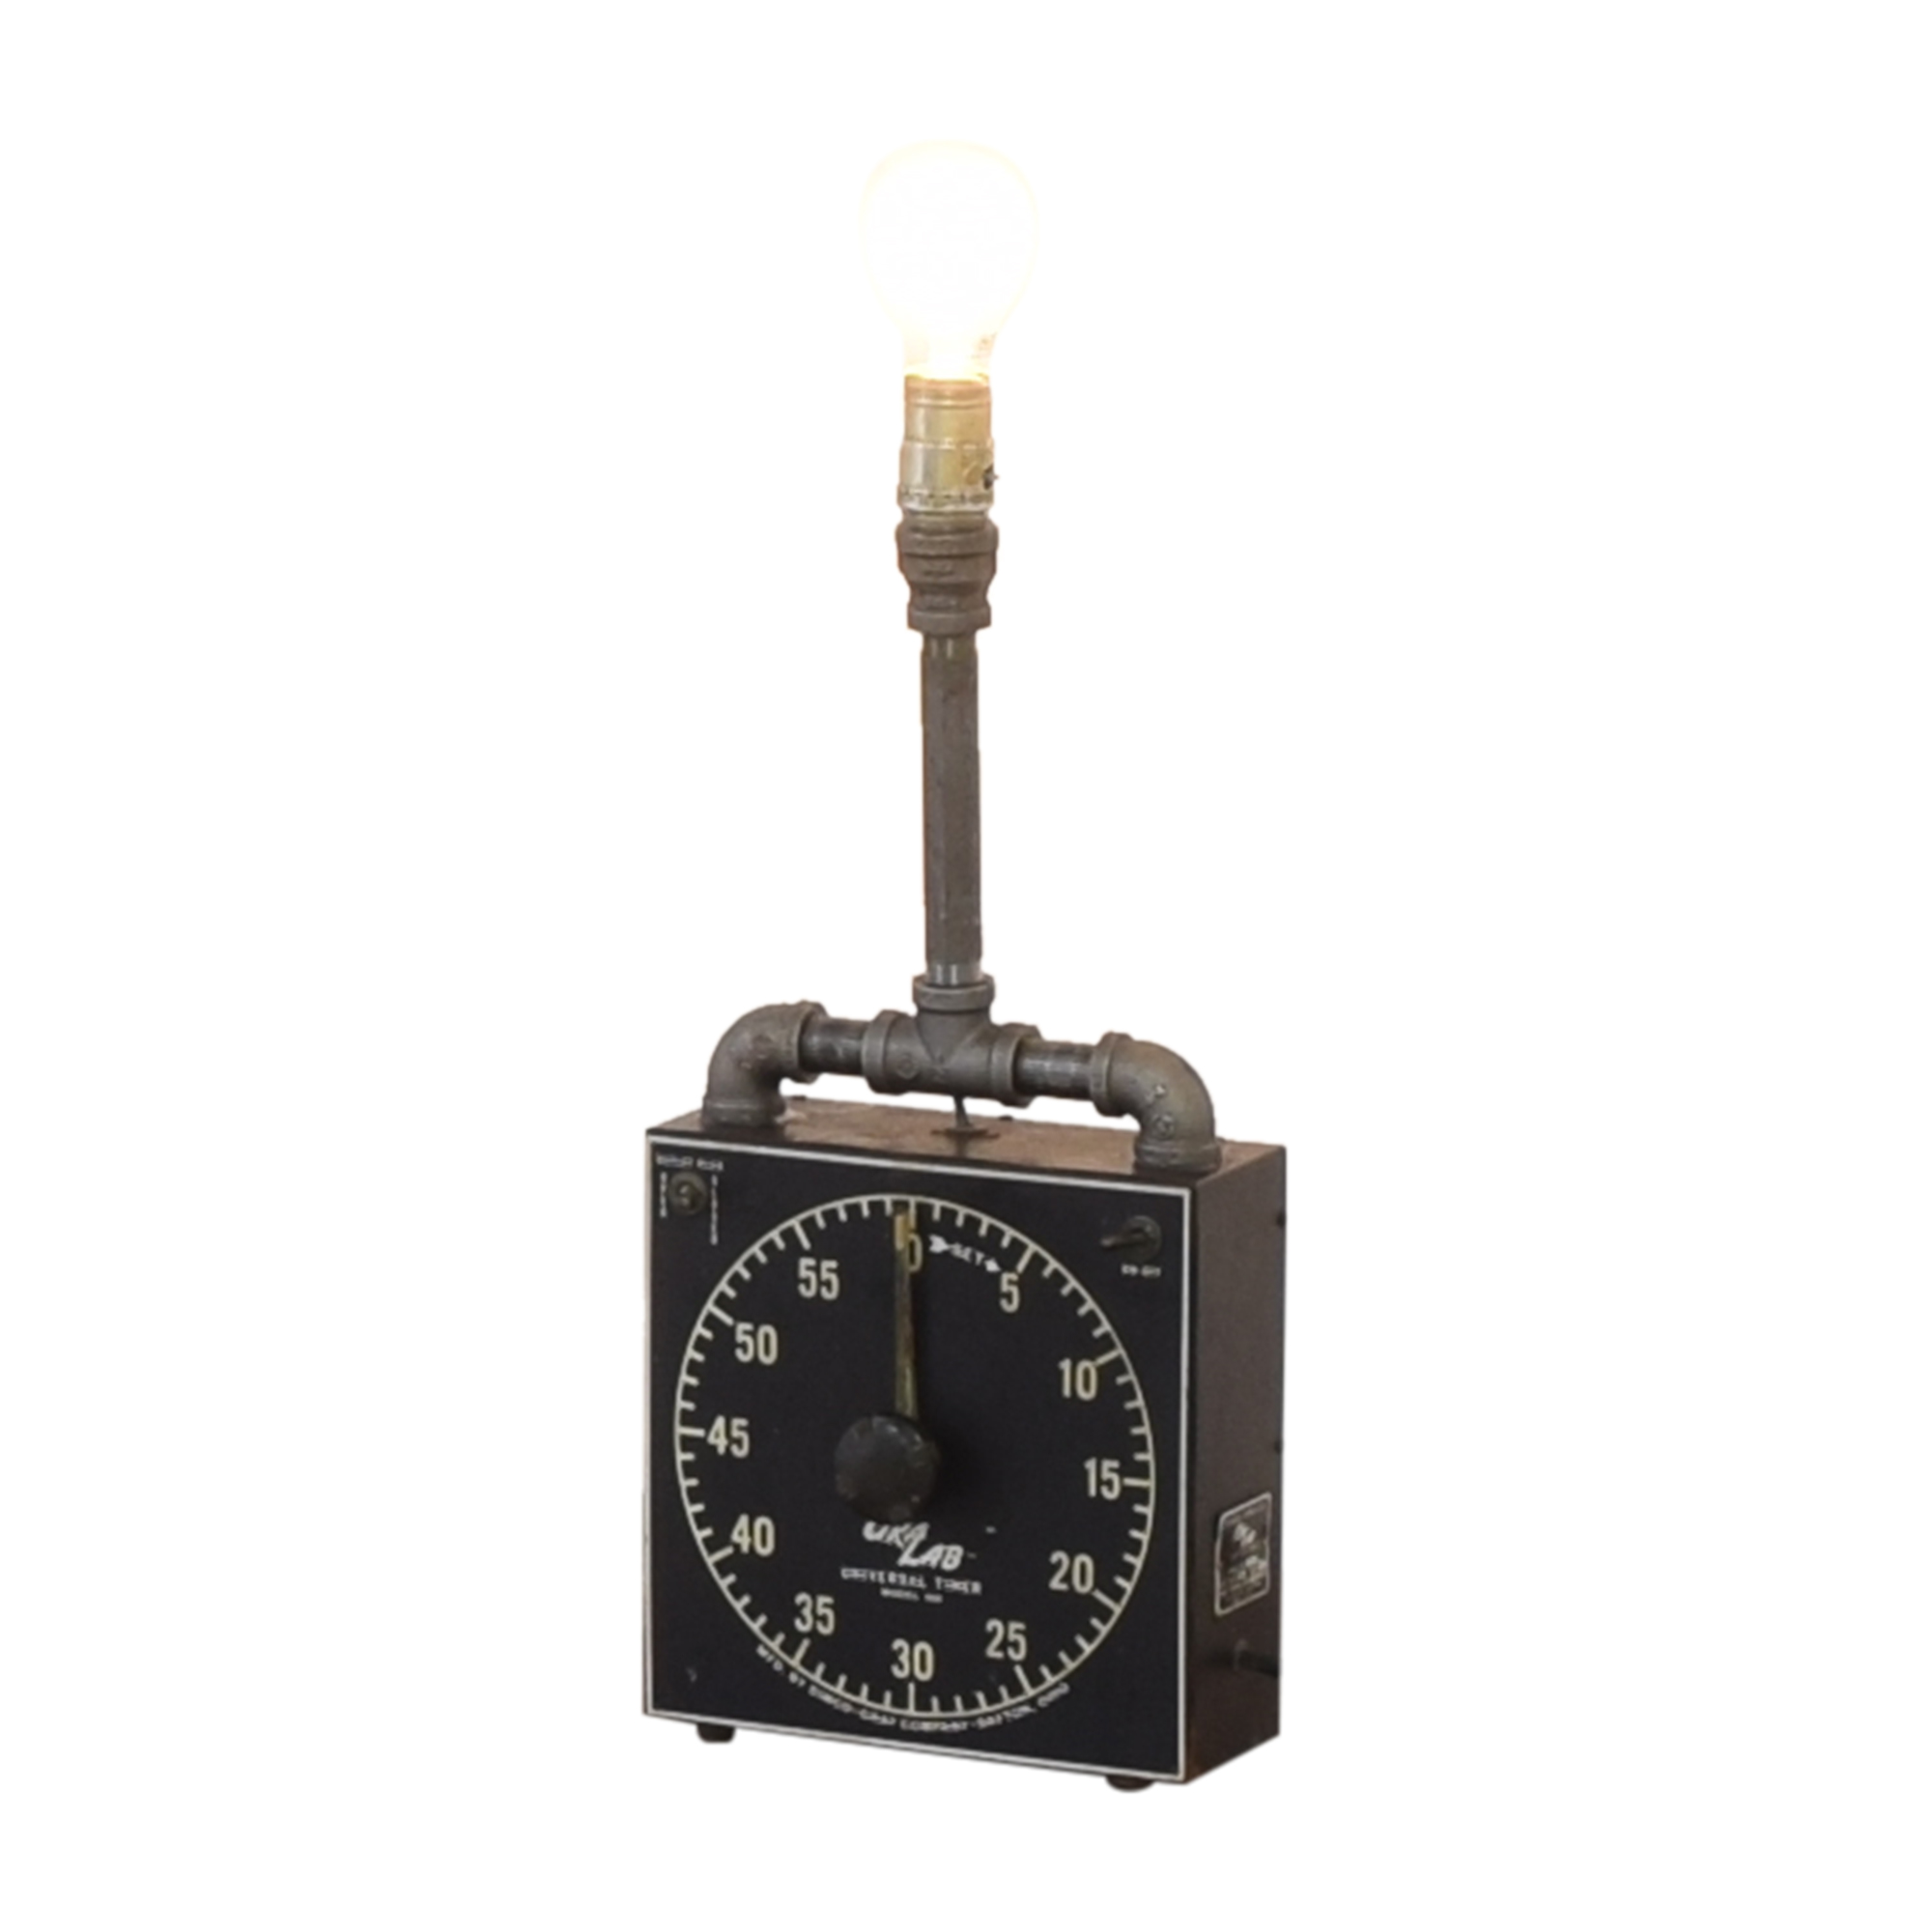 GraLab Darkroom Timer Table Lamp dimensions